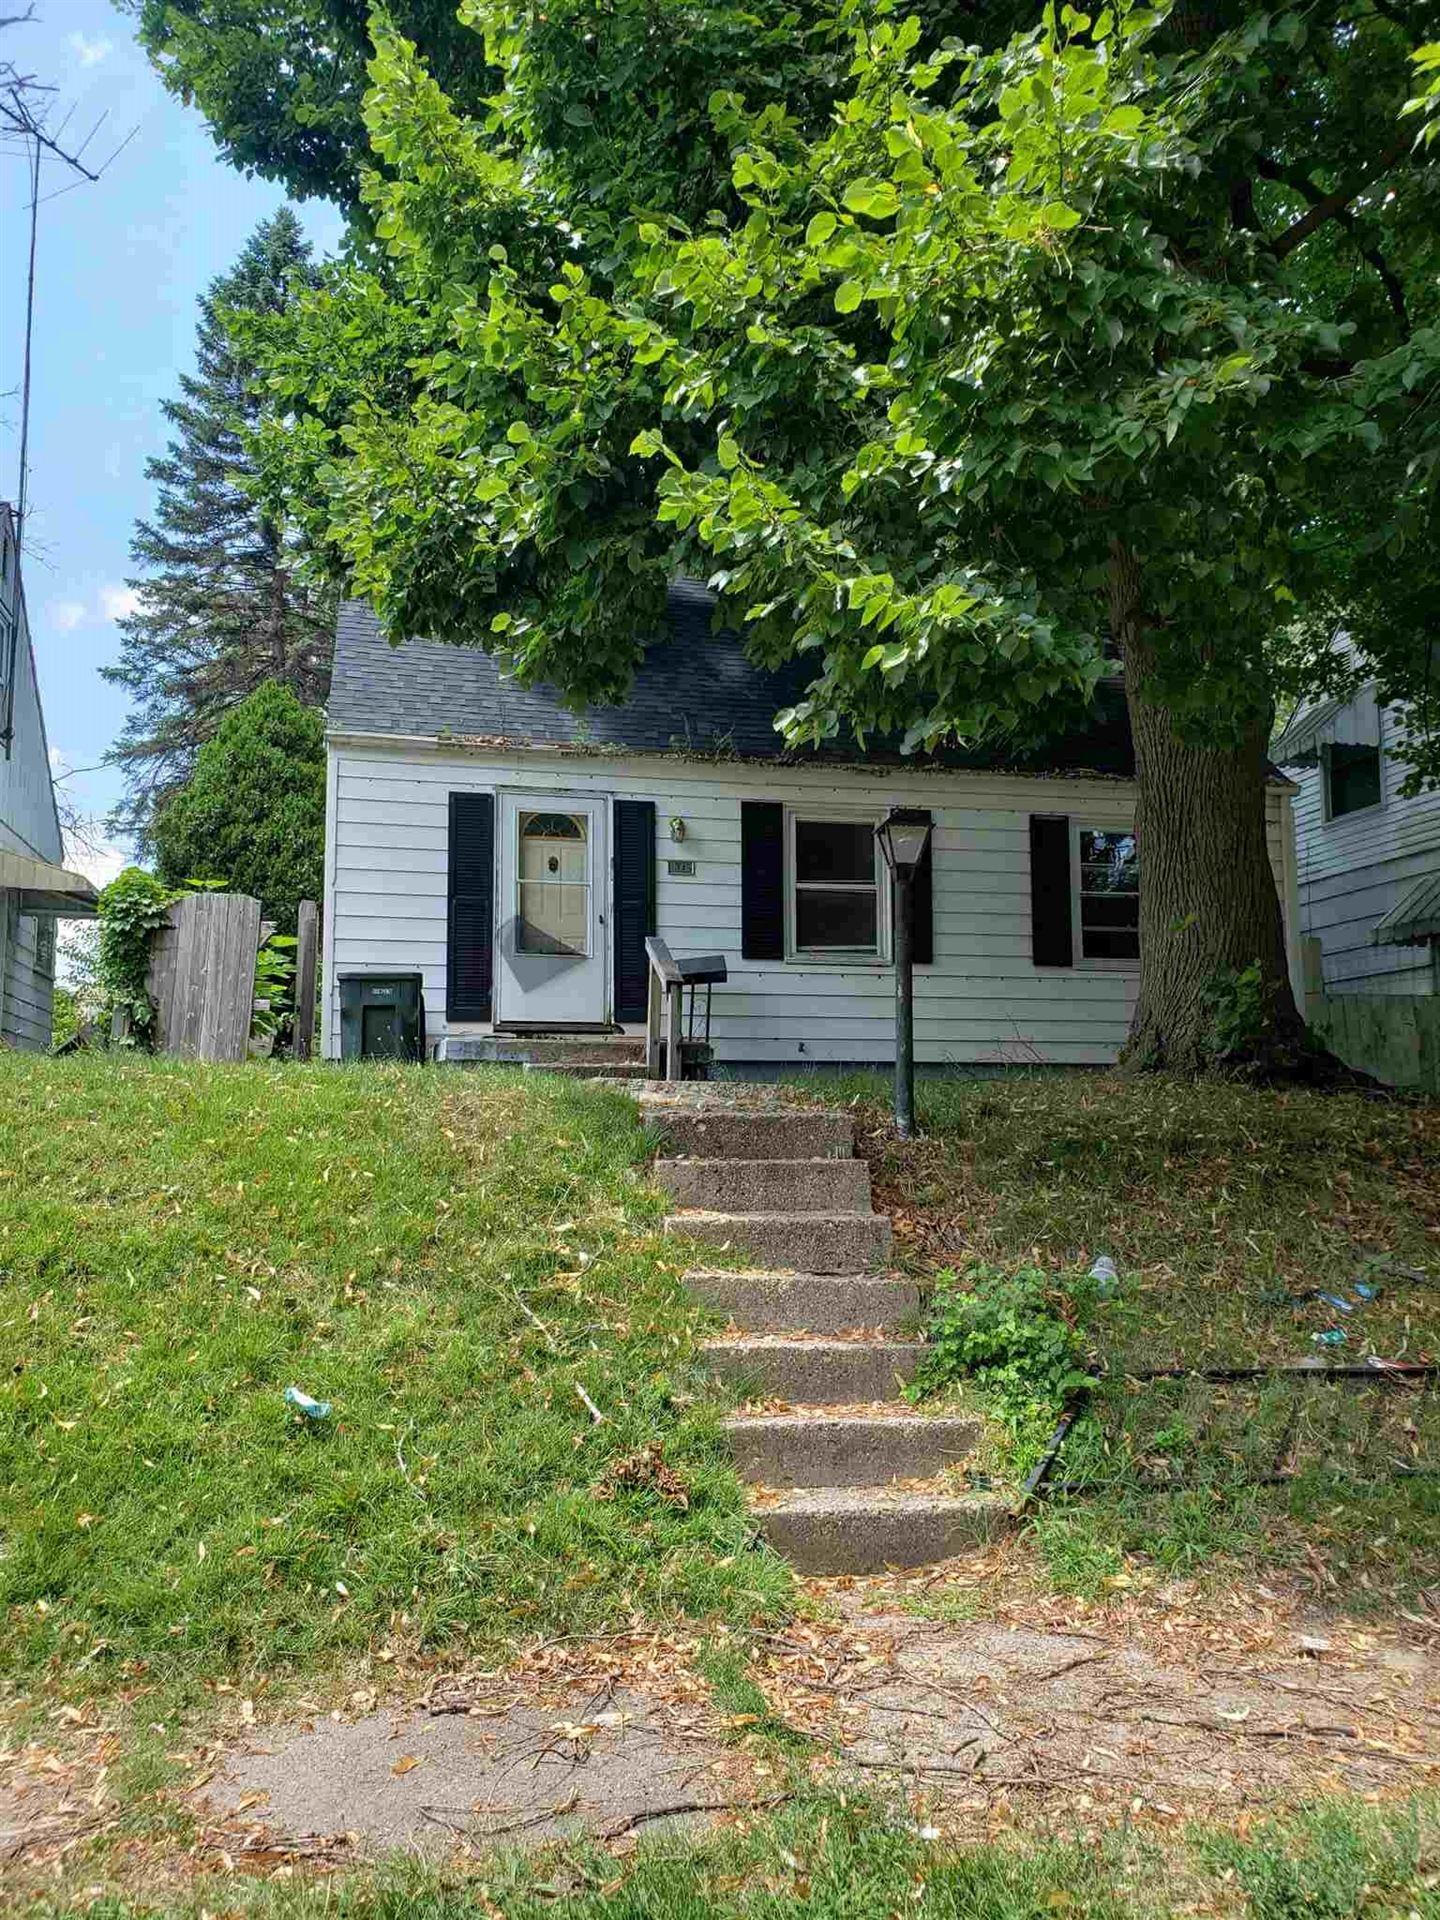 1745 N Johnson Street, South Bend, IN 46628 - #: 202042565